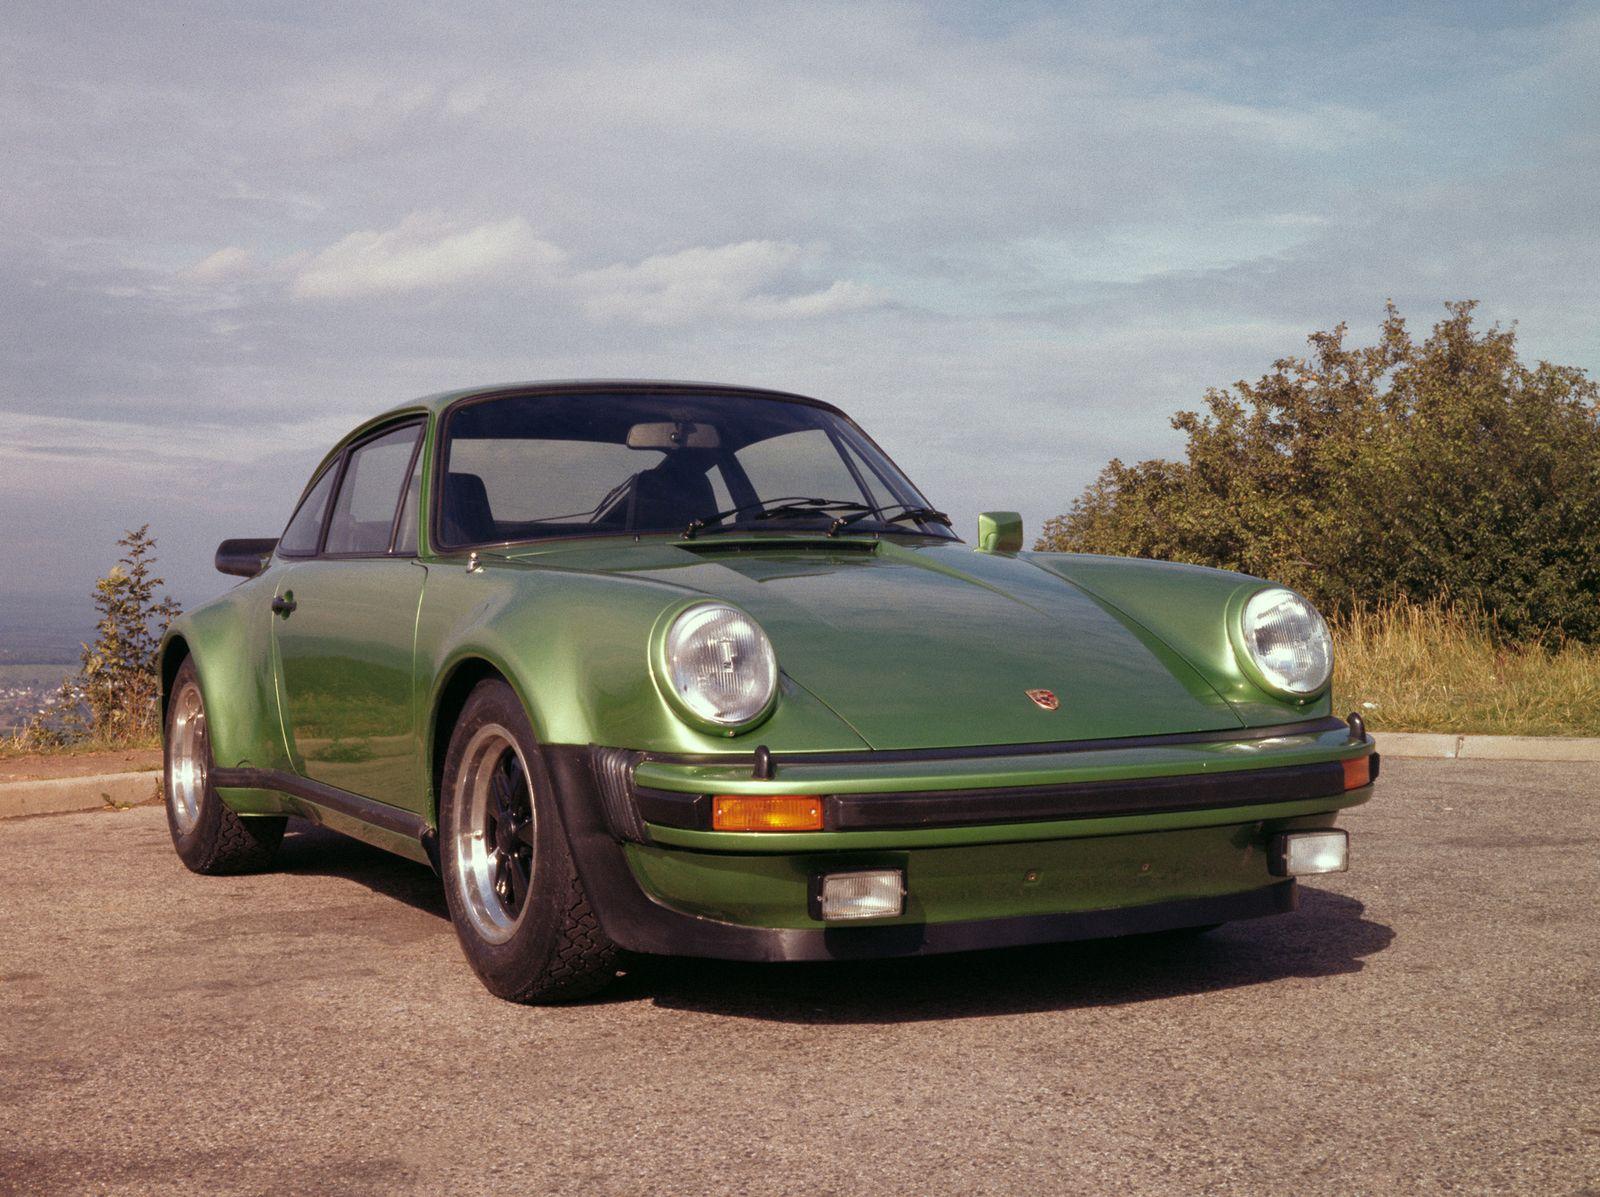 Turbo / Porsche 911 Turbo 1975